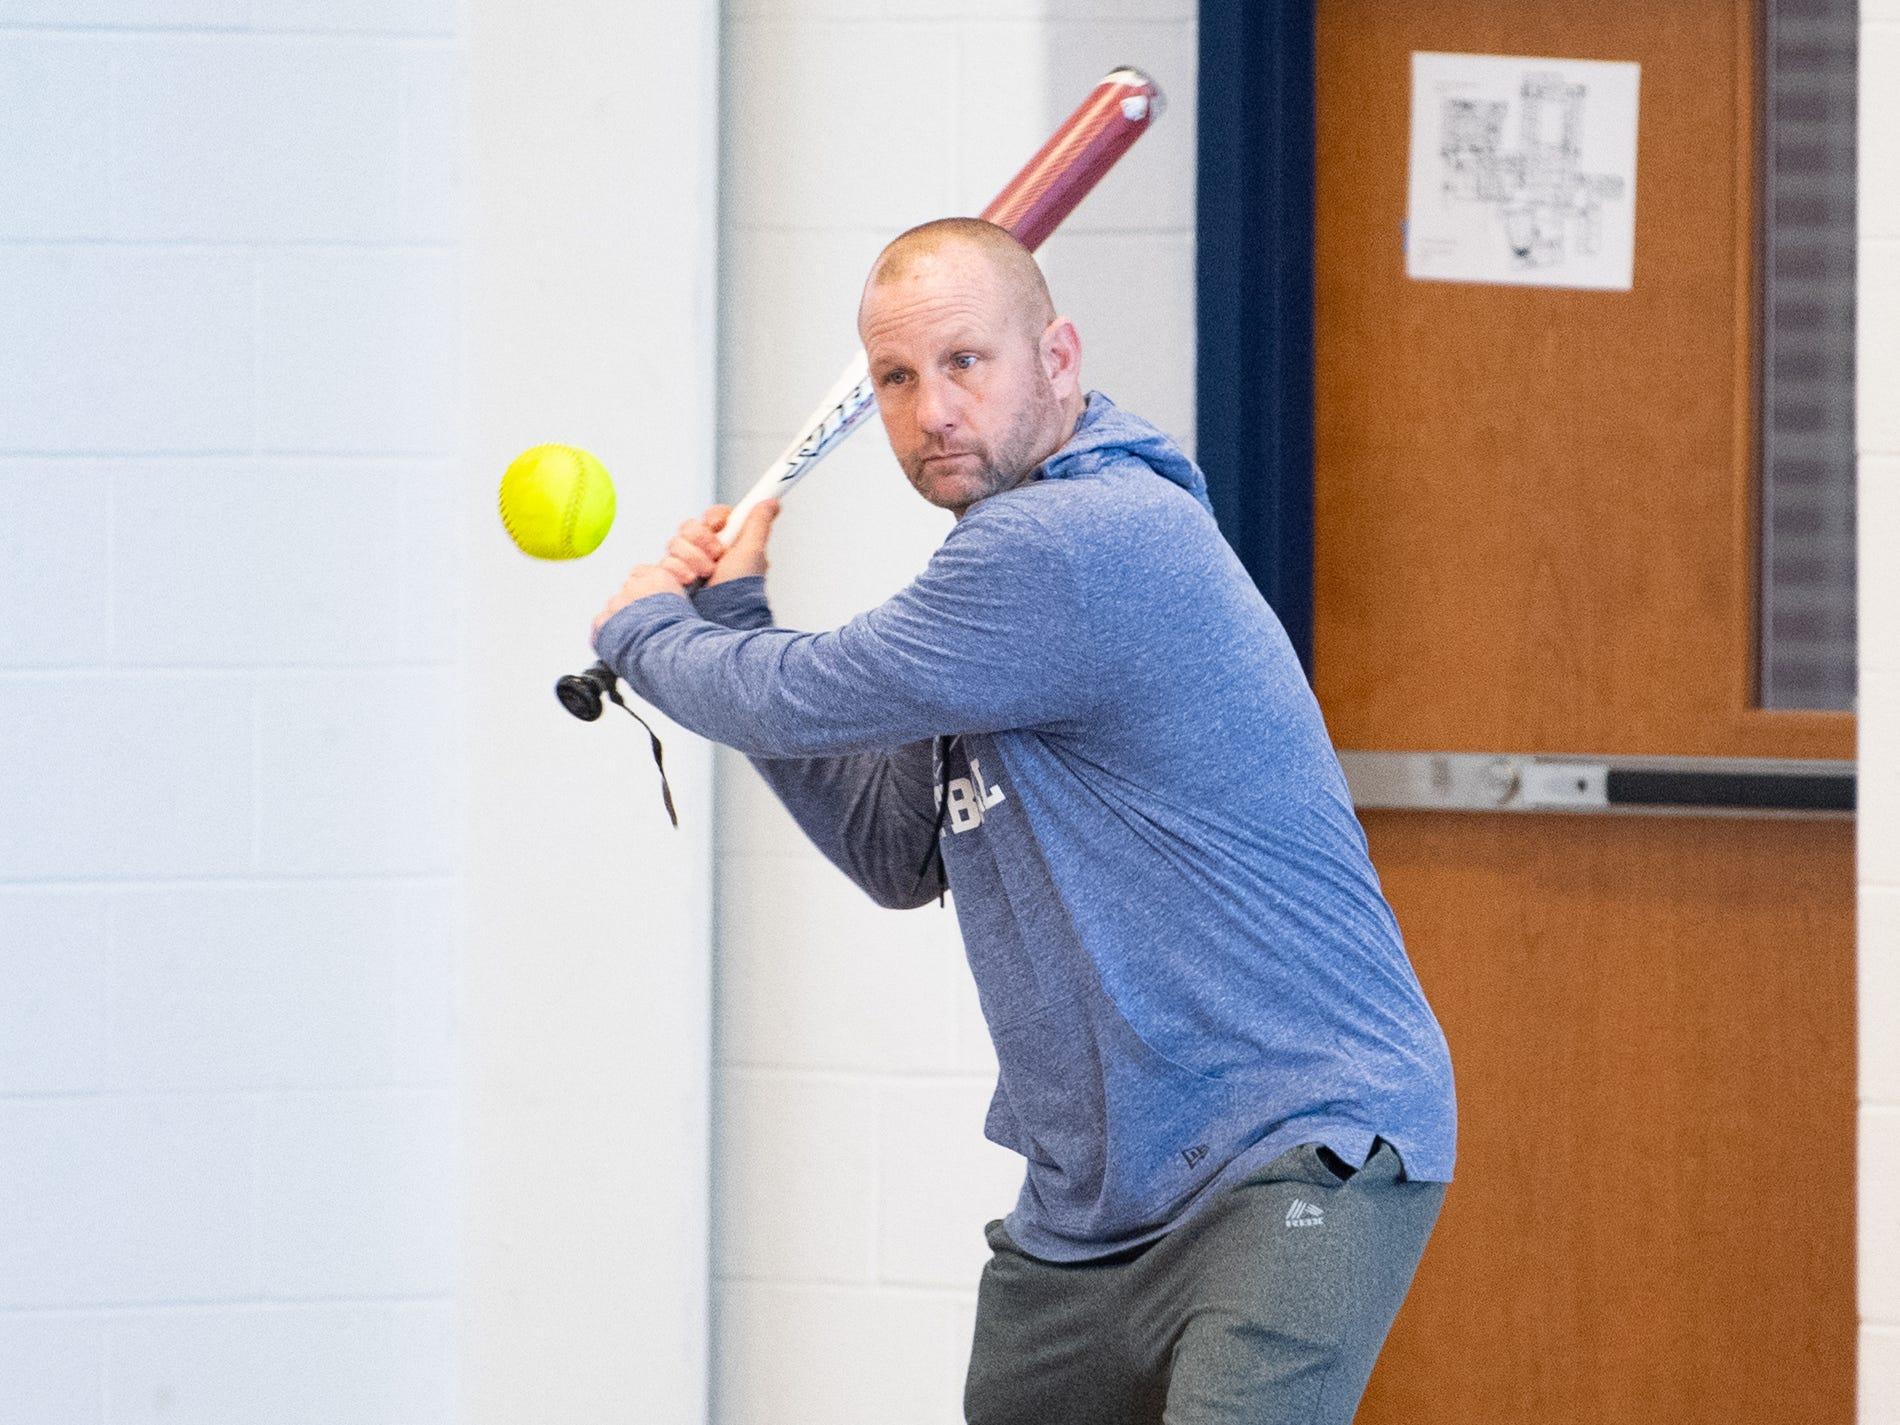 West York's head softball coach tests each baseman by hitting a ball their way, March 5, 2019.